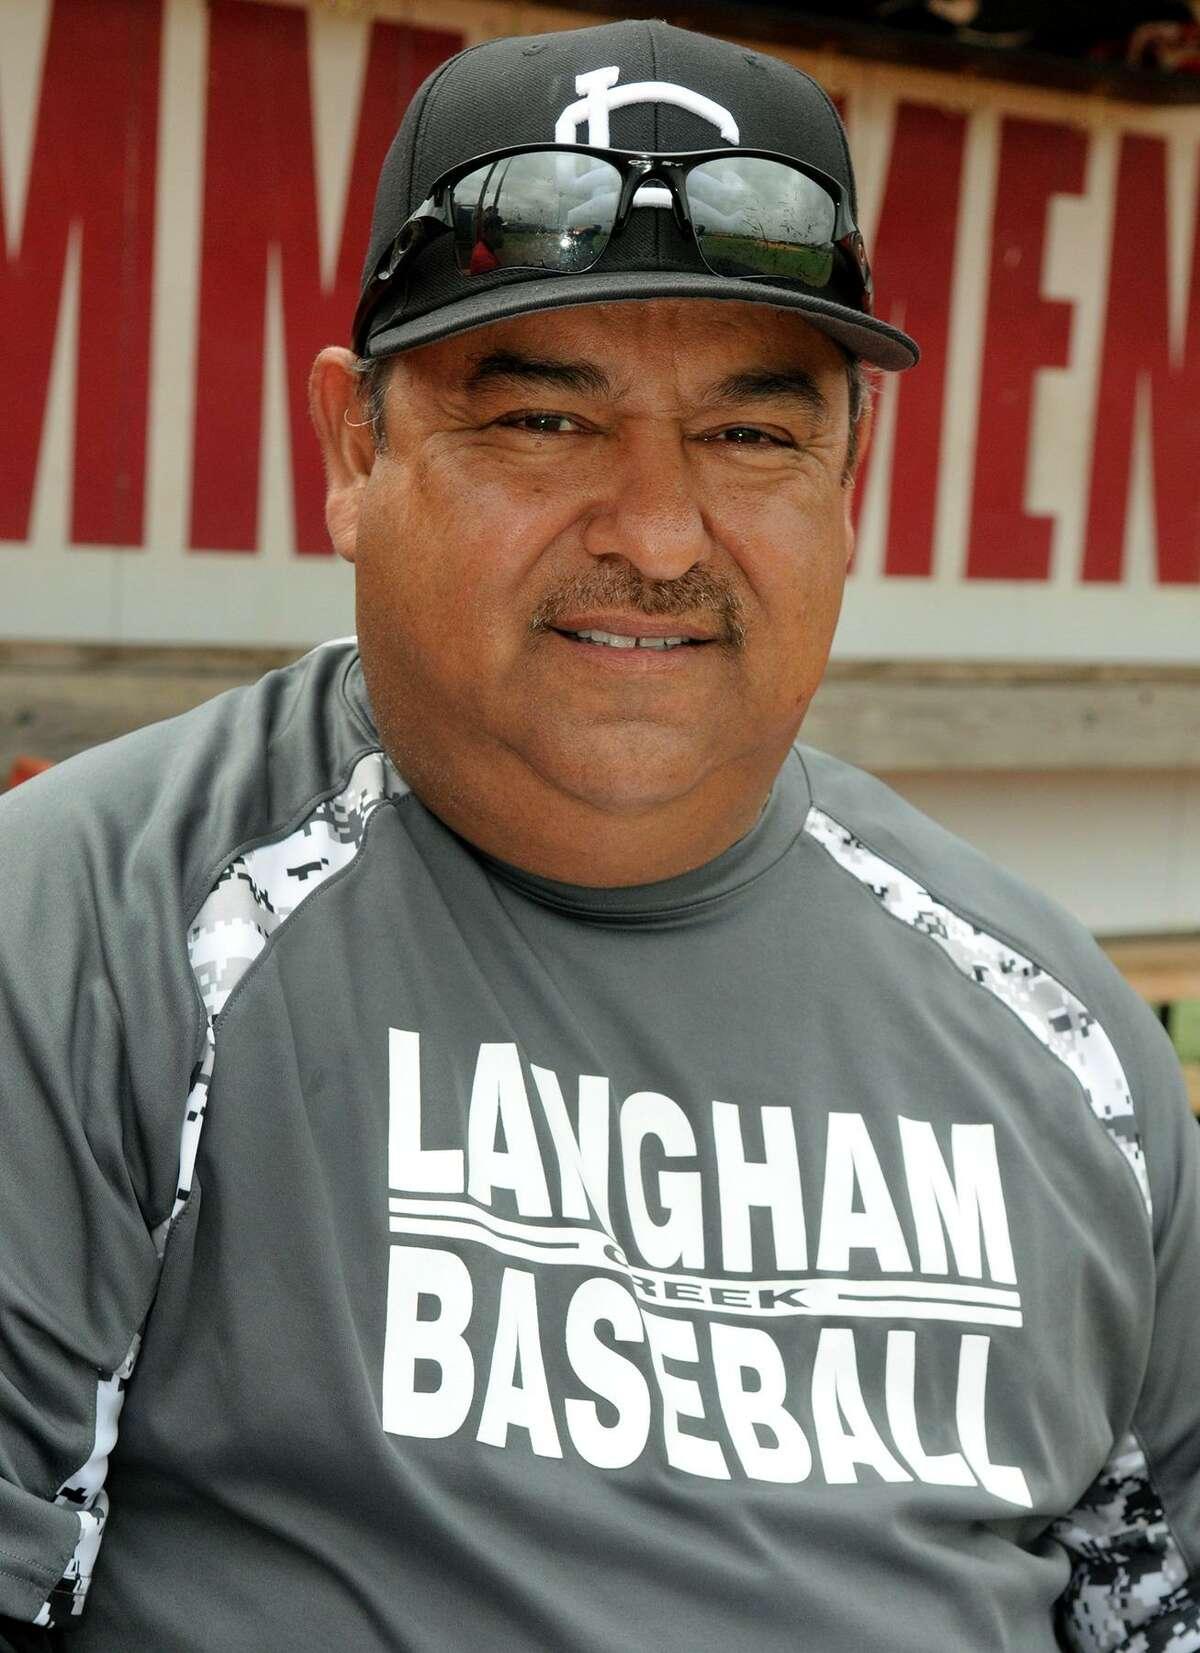 Langham Creek 29th year head baseball coach Armando Sedeño.